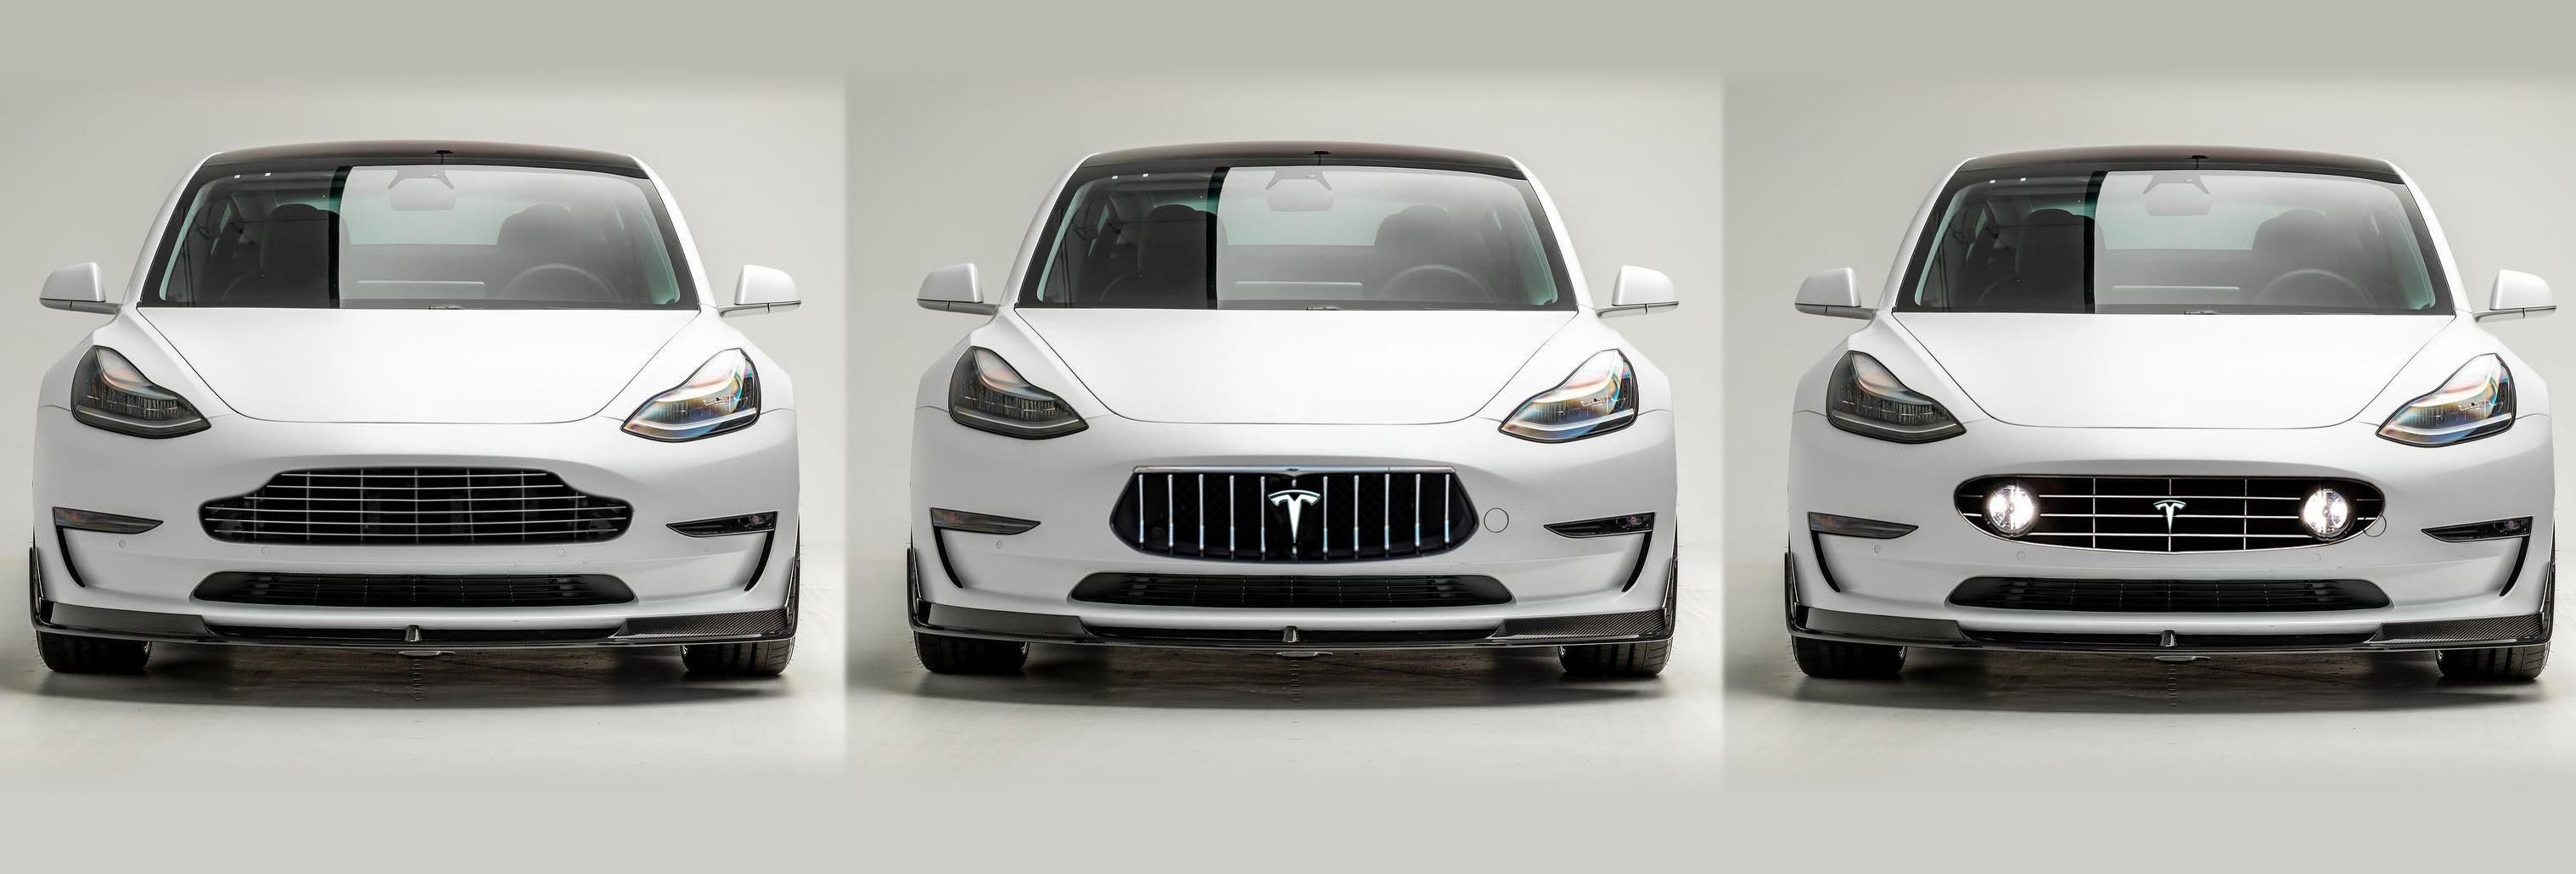 Tesla_Model3_grills